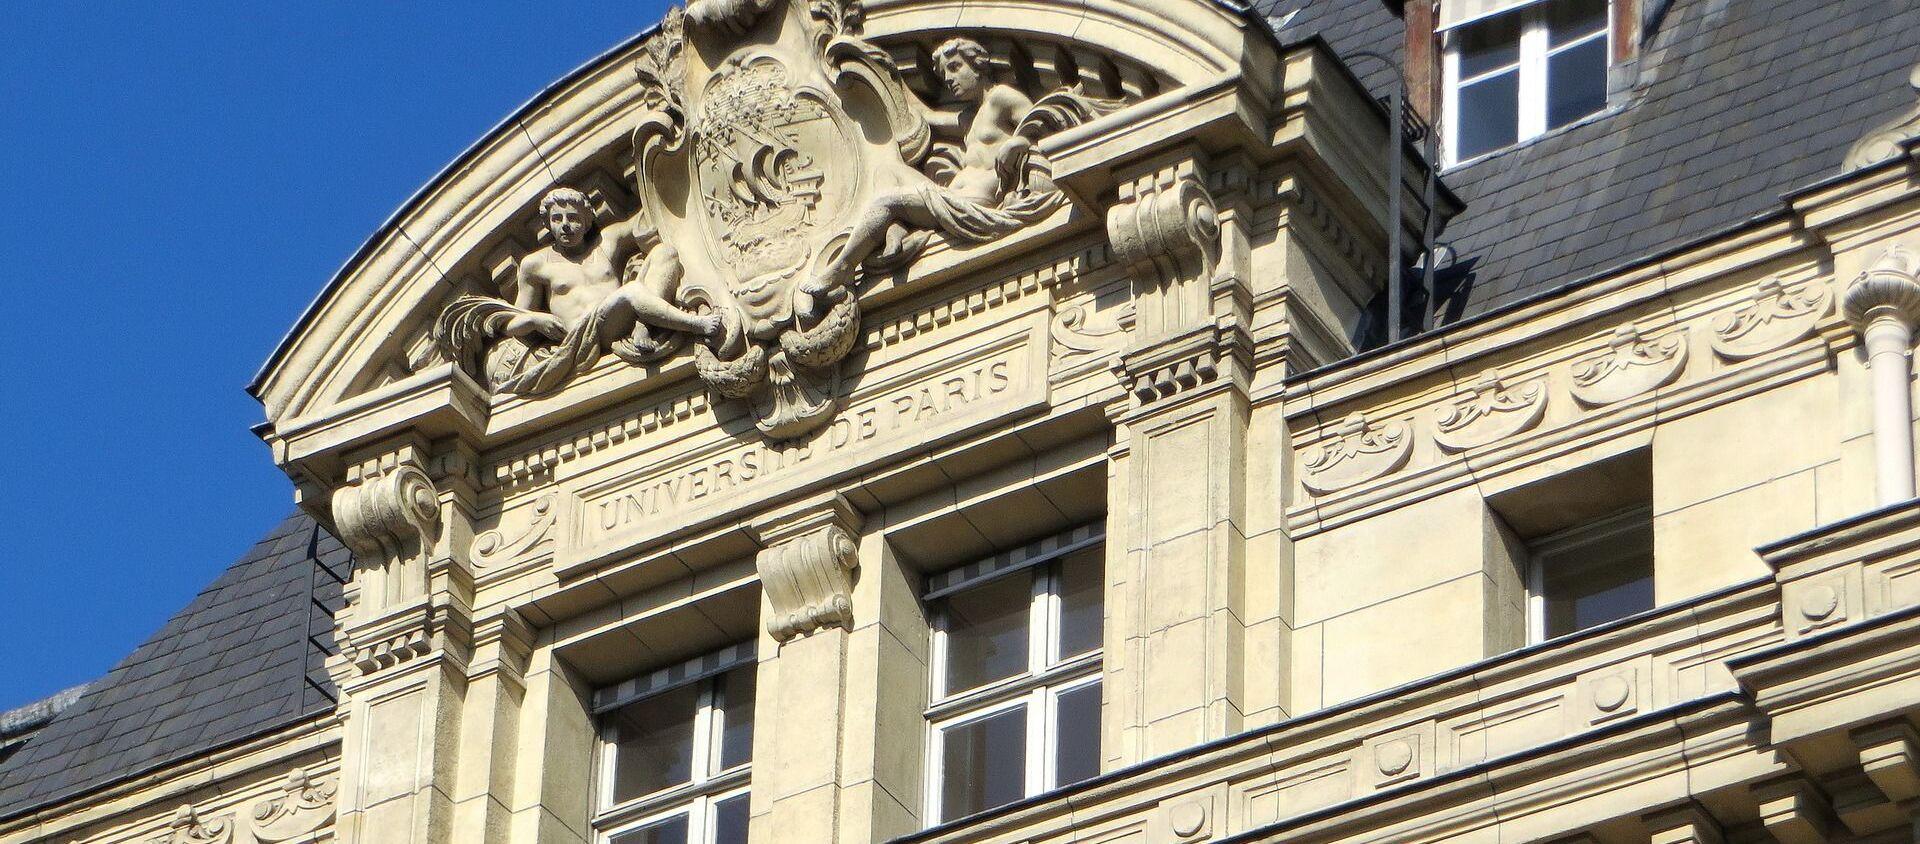 La Sorbonne - Sputnik France, 1920, 18.02.2021